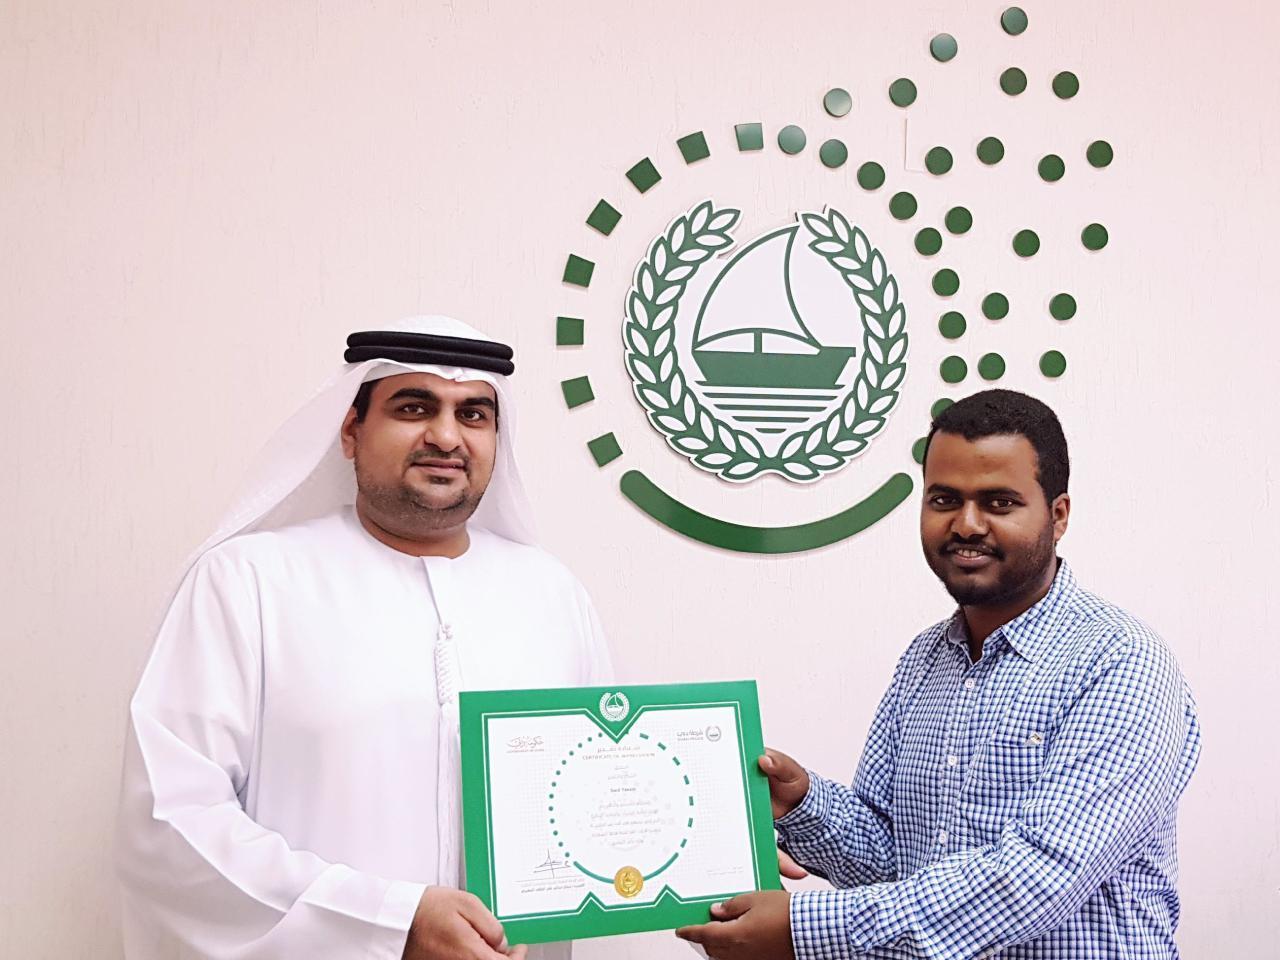 Seid Yassin awarded Certificate of Appreciation by Dubai Police